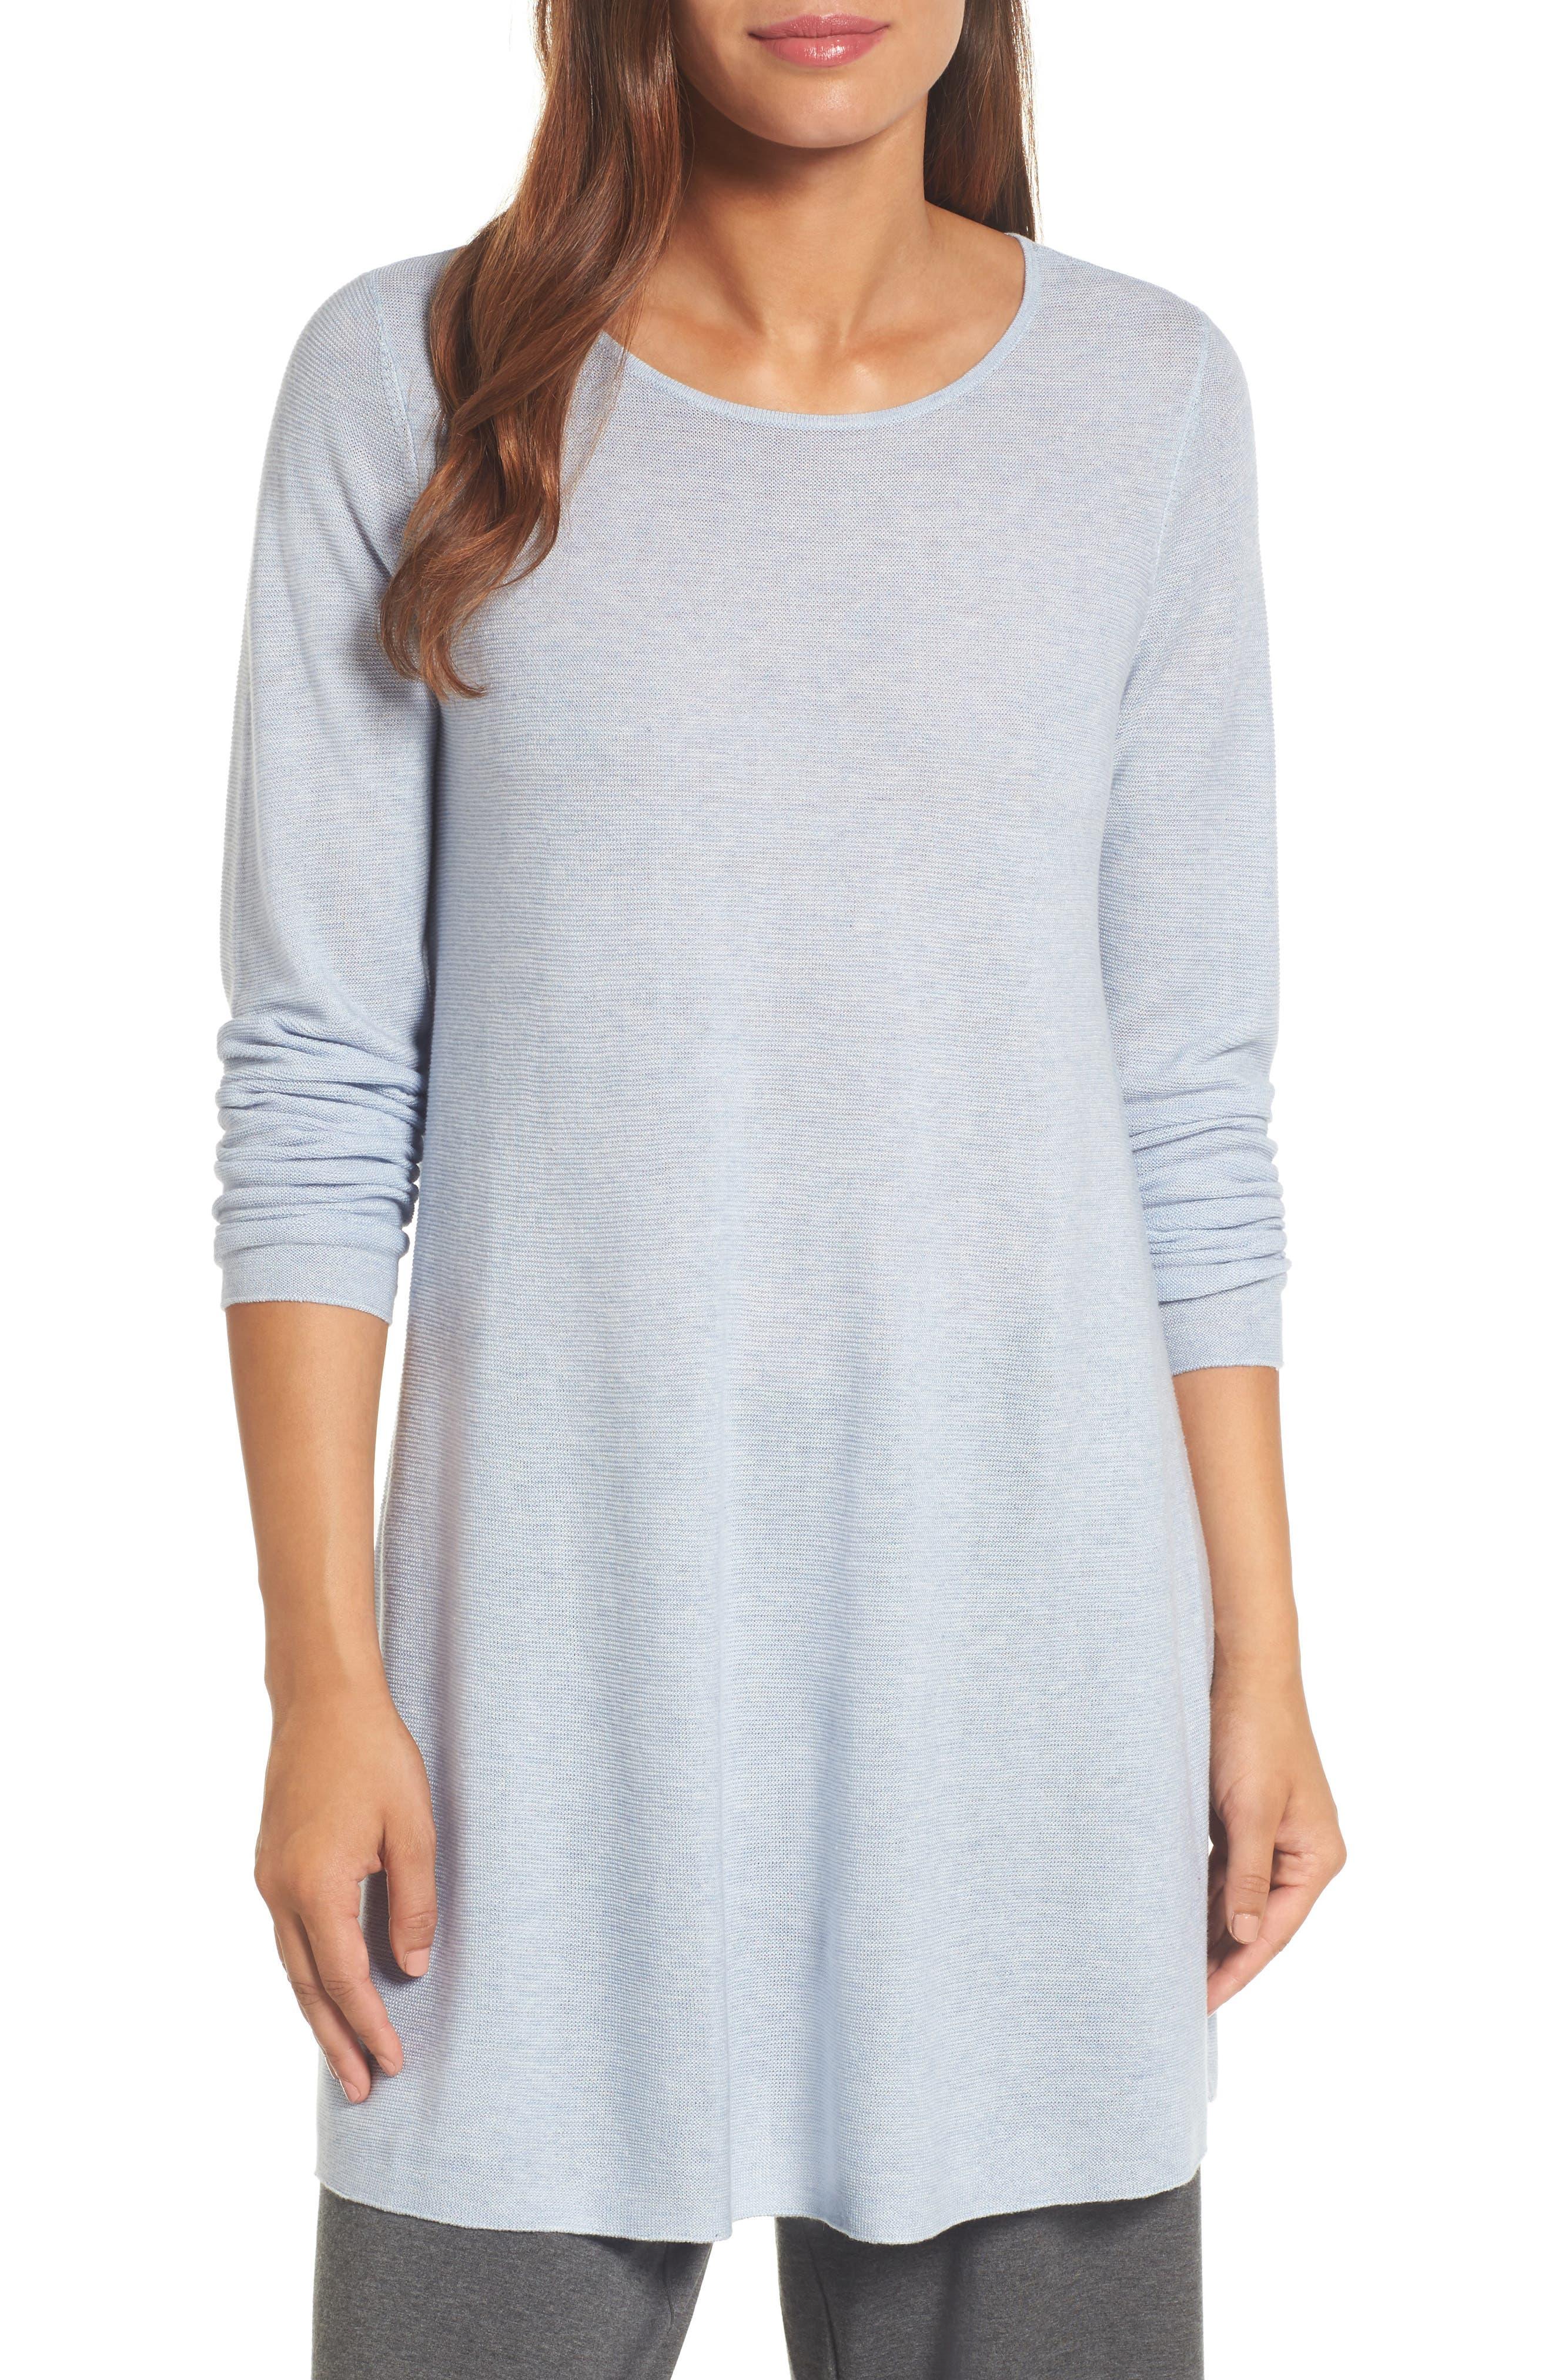 Jewel Neck Tunic Sweater,                             Main thumbnail 1, color,                             Delphine